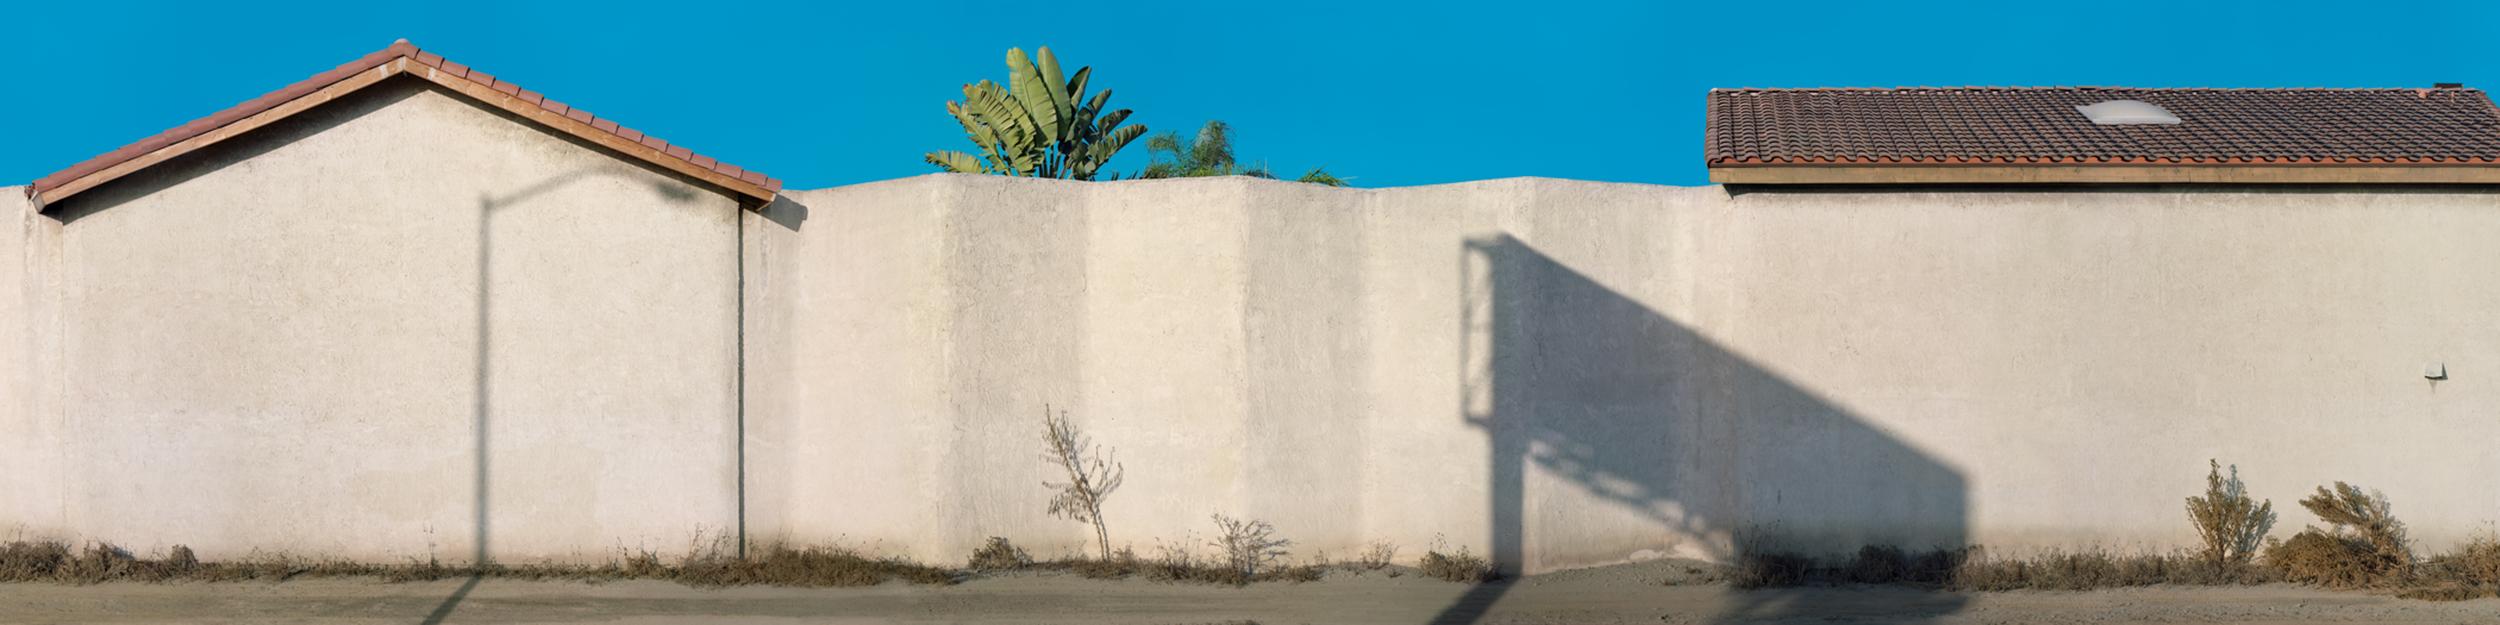 Afriges-20090823-1.jpg